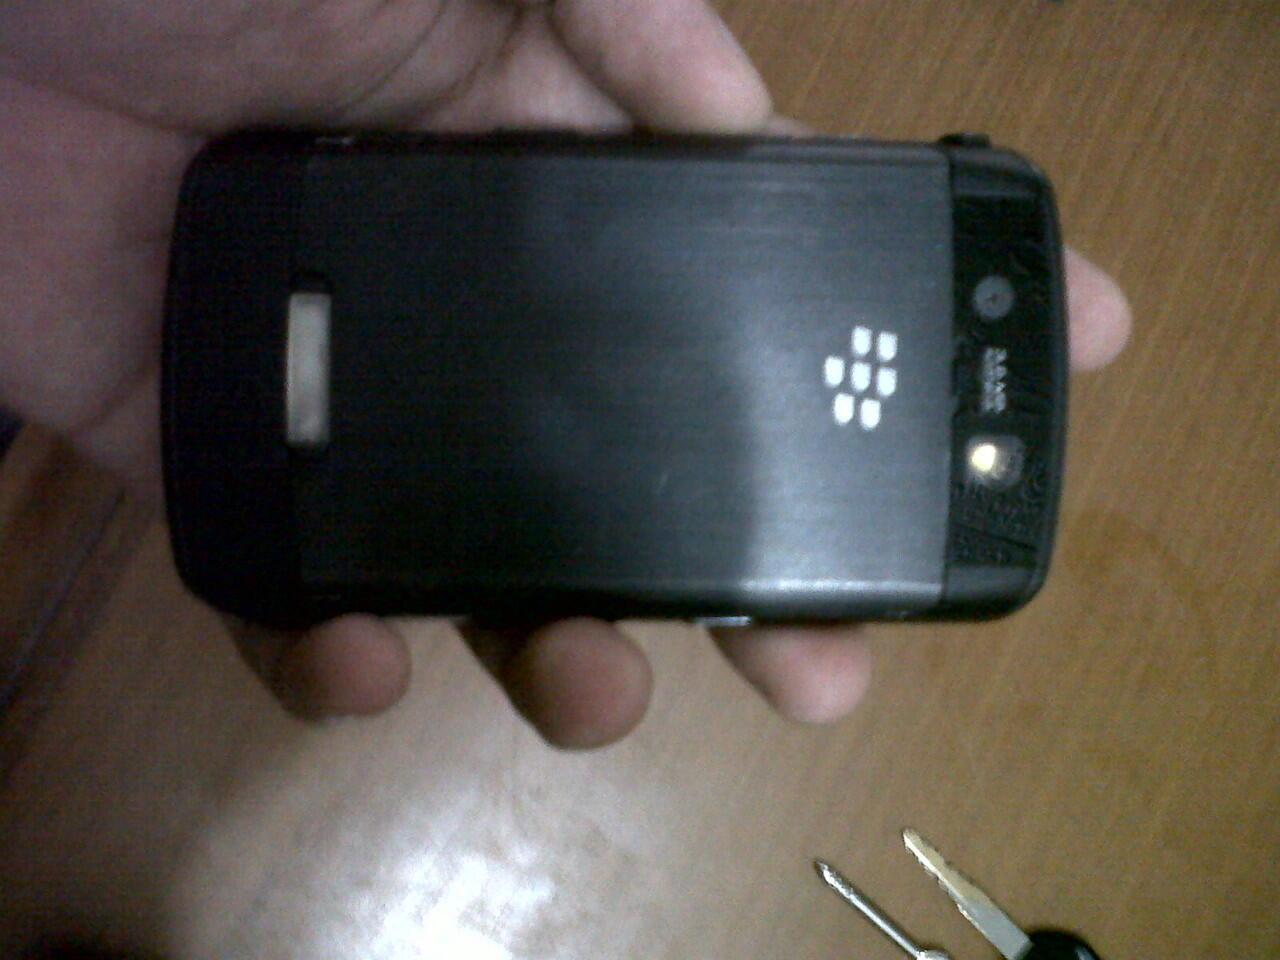 WTS : BB STORM 1 9530 3G CDMA Fullset Bandung